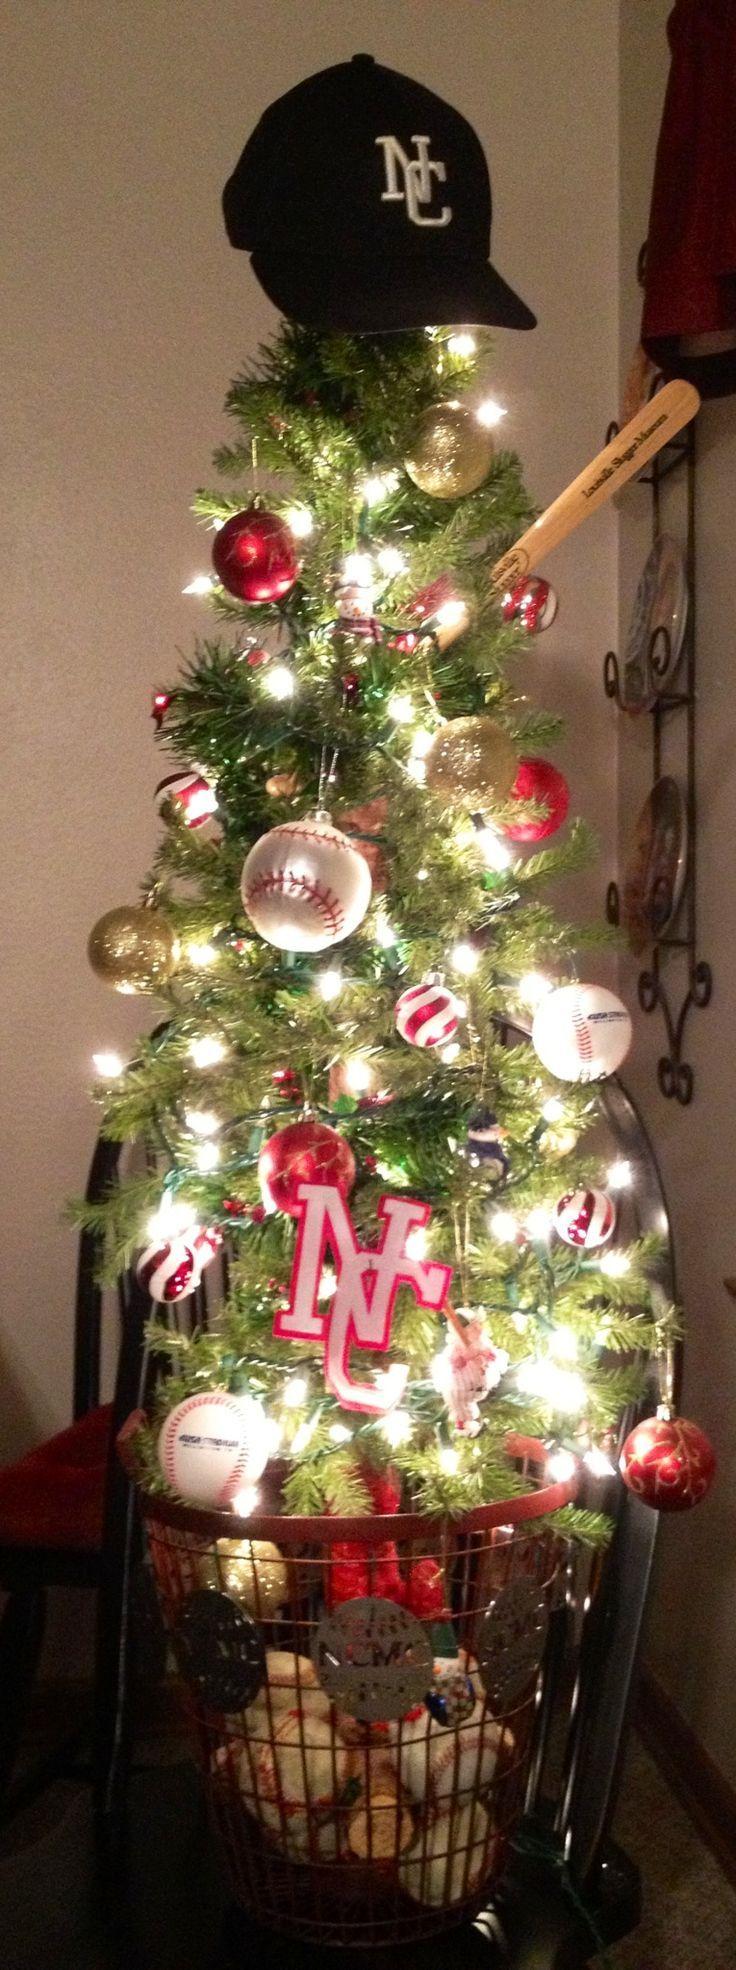 Baseball Christmas treeI love it but would